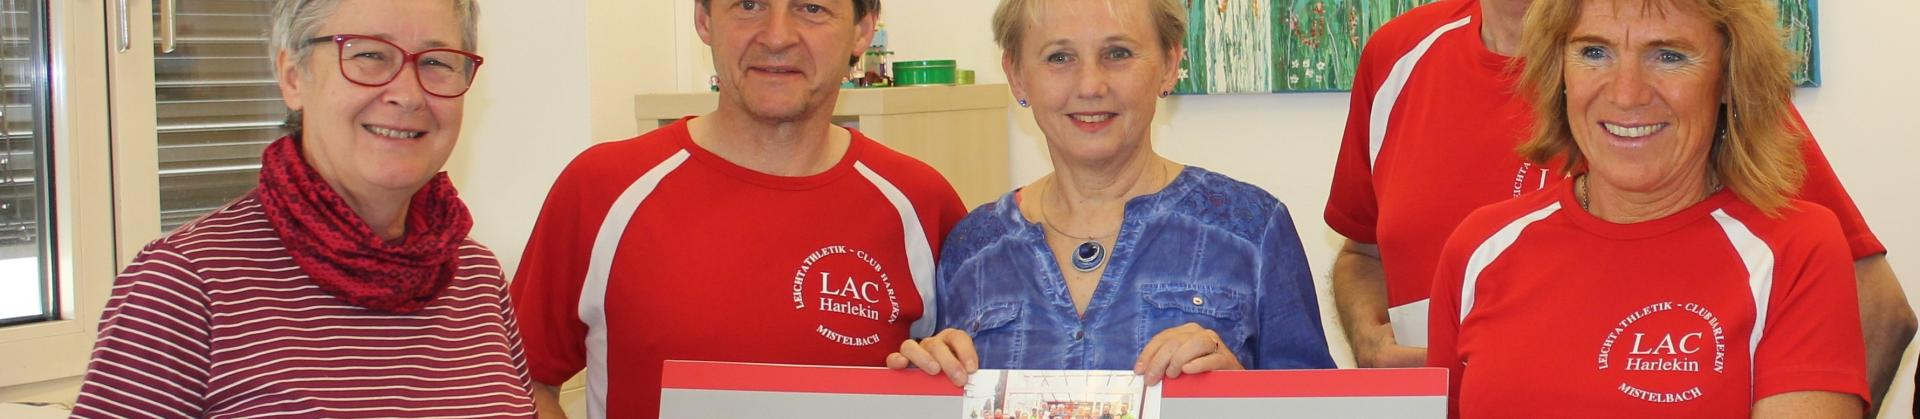 Charity Lauf des LAC Harlekin mit DSA Roswitha Tscherkassky-Koularas